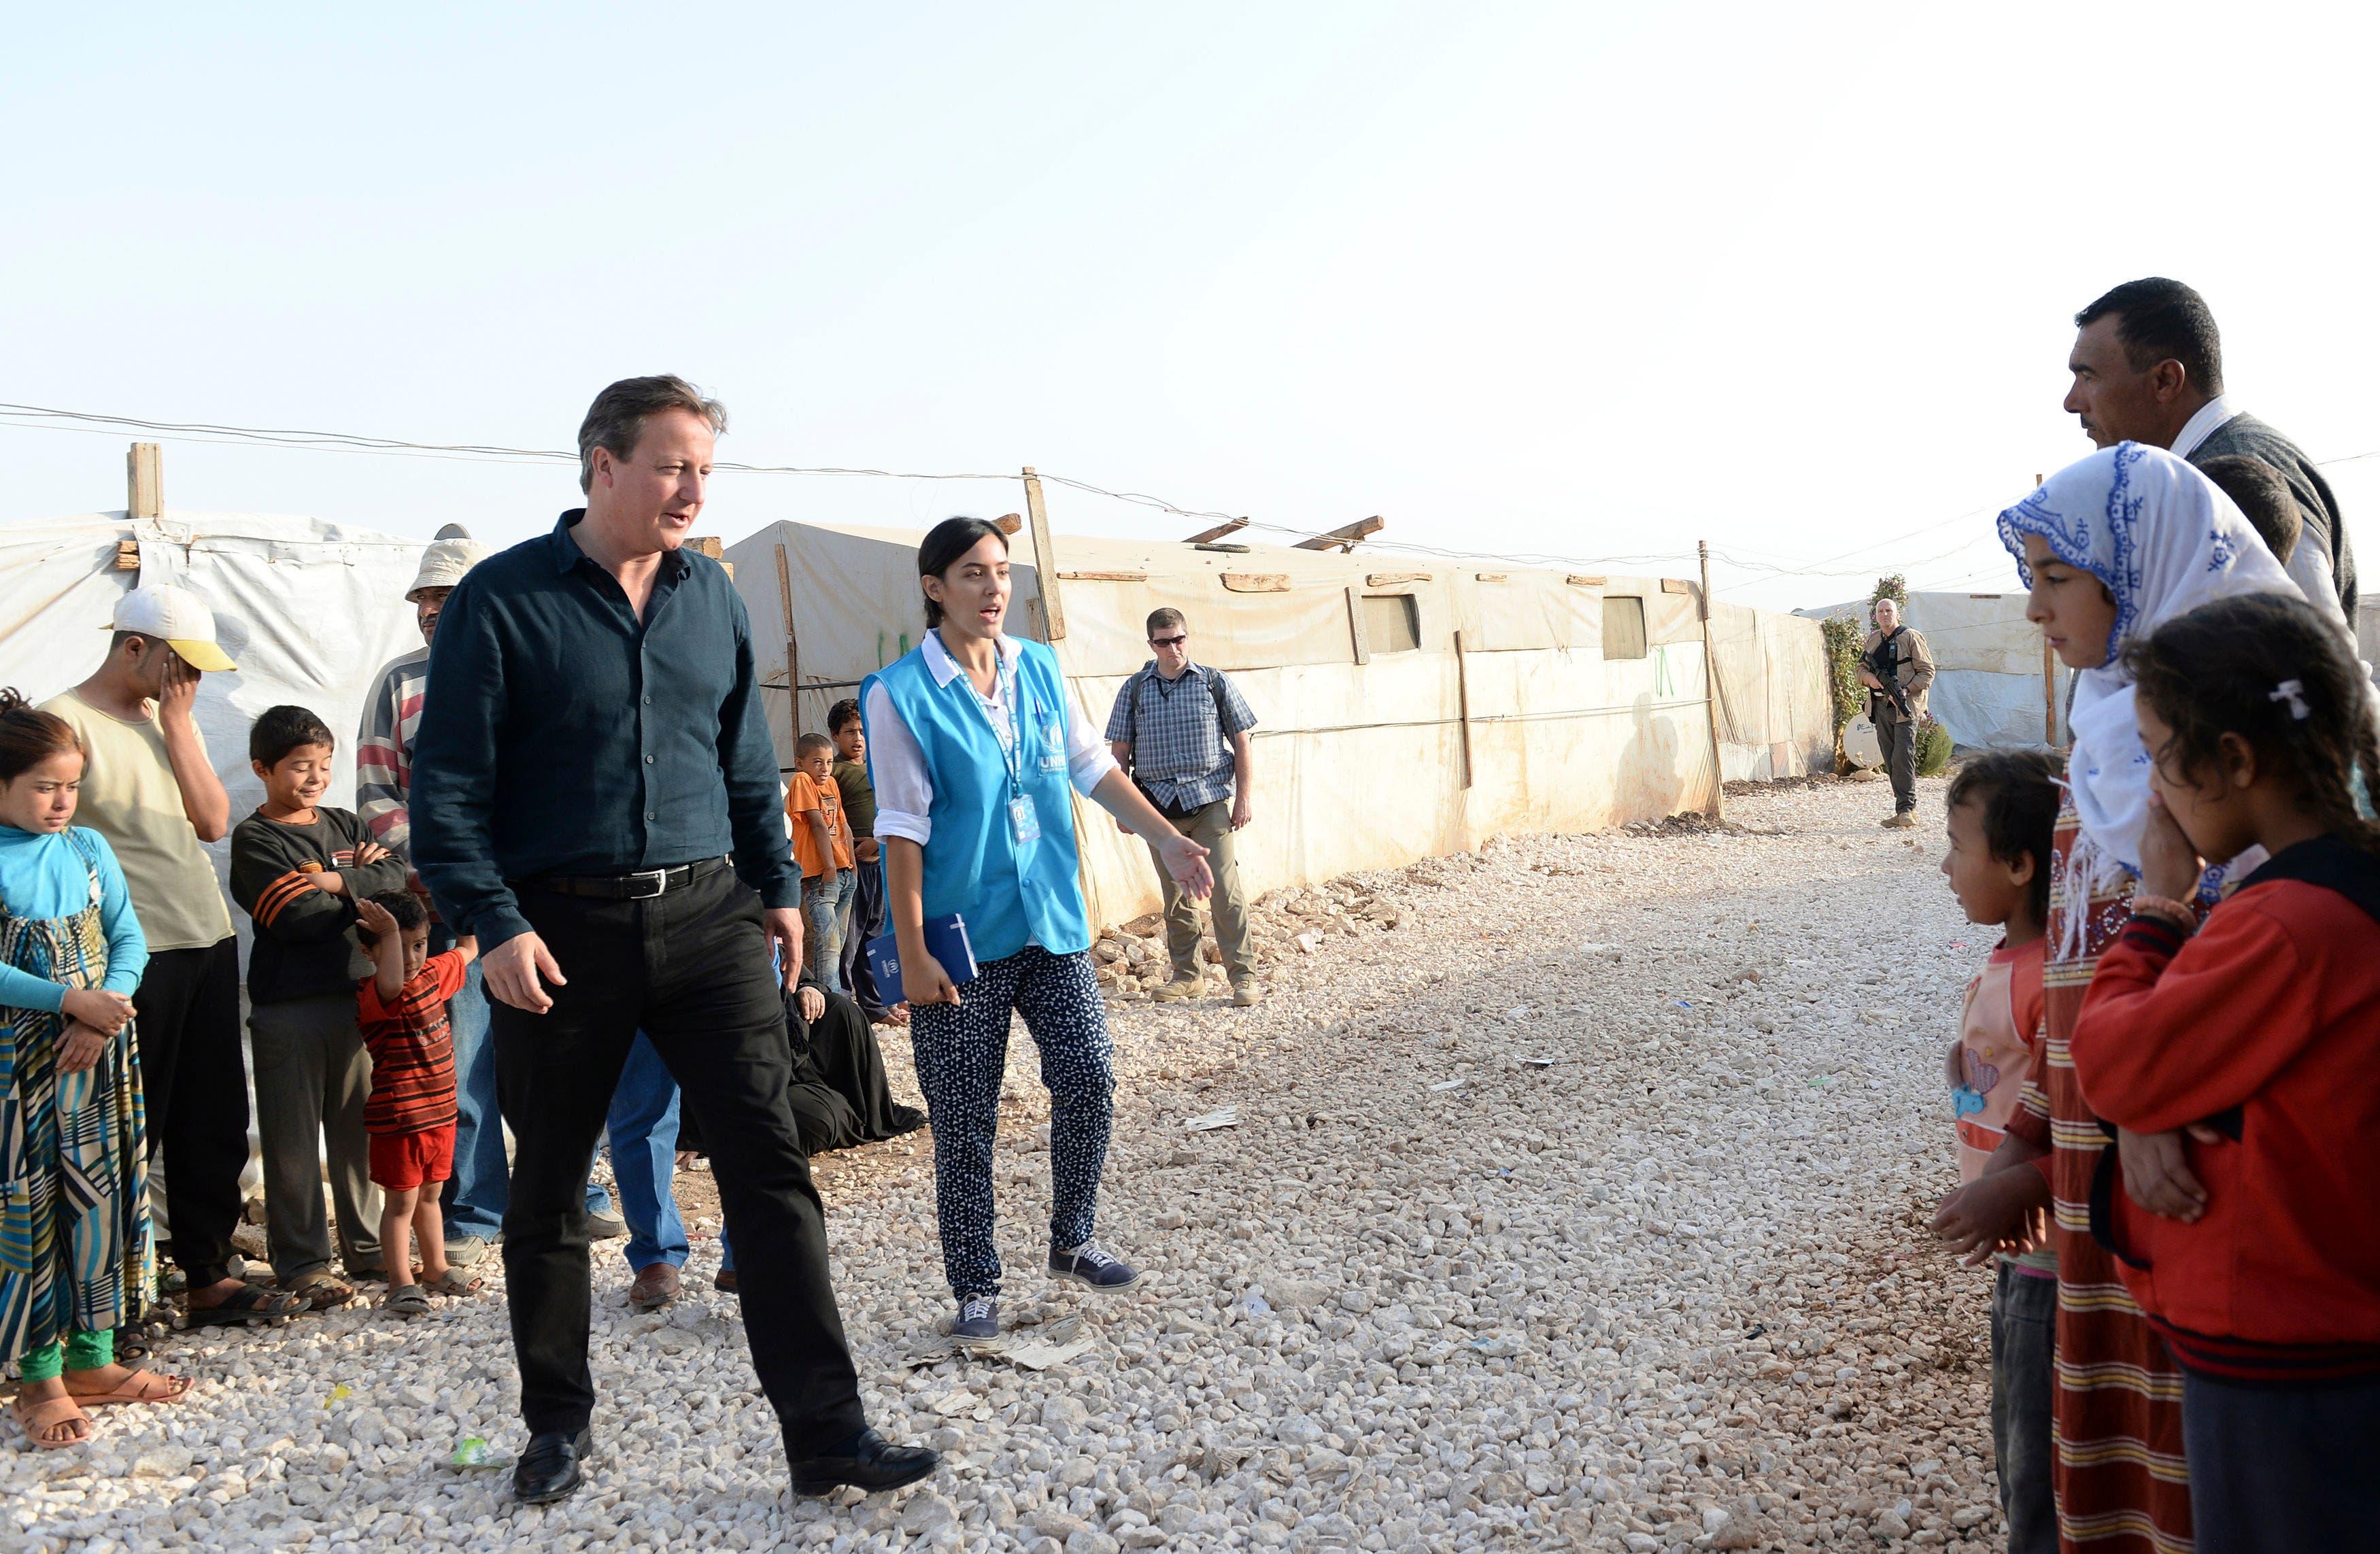 Cameron visits refugee camp